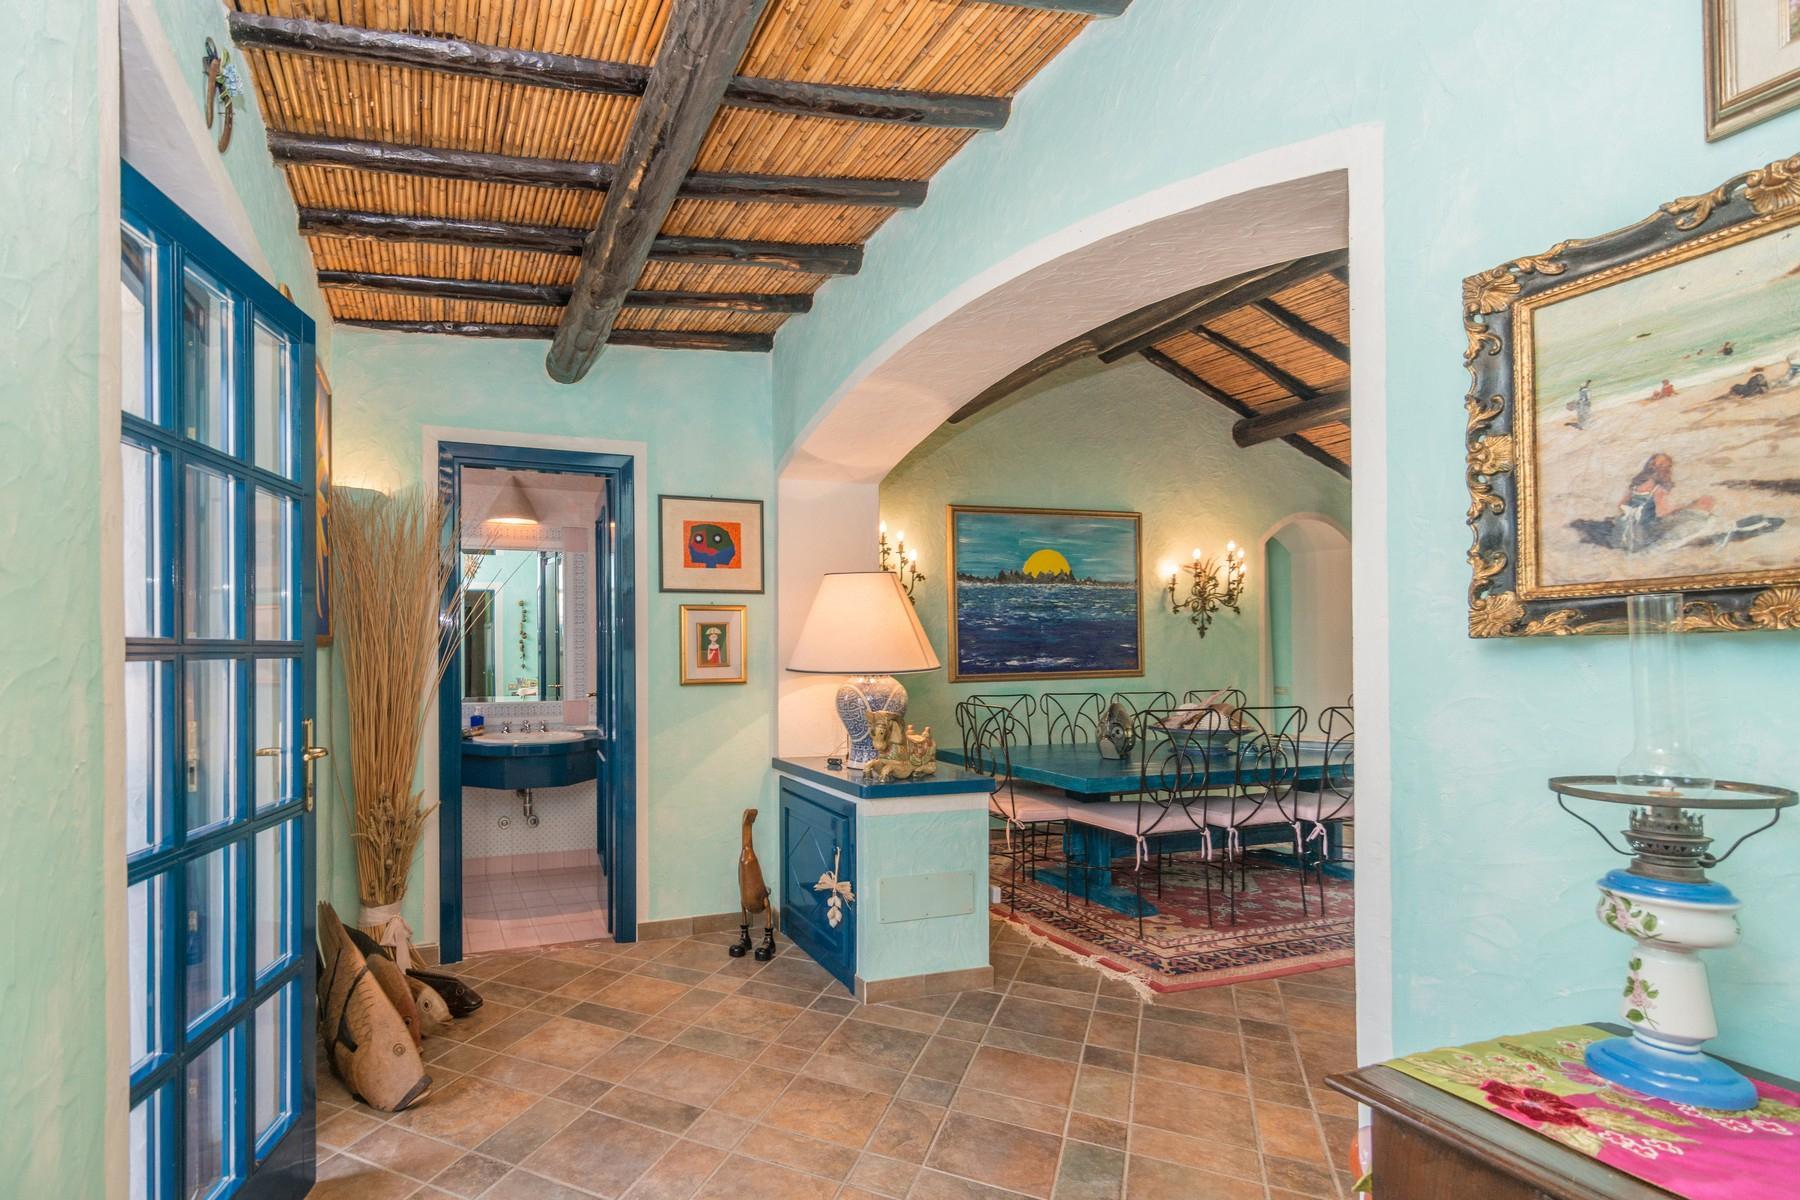 San Pantaleo Wonderful estate in the heart of Gallura - 18